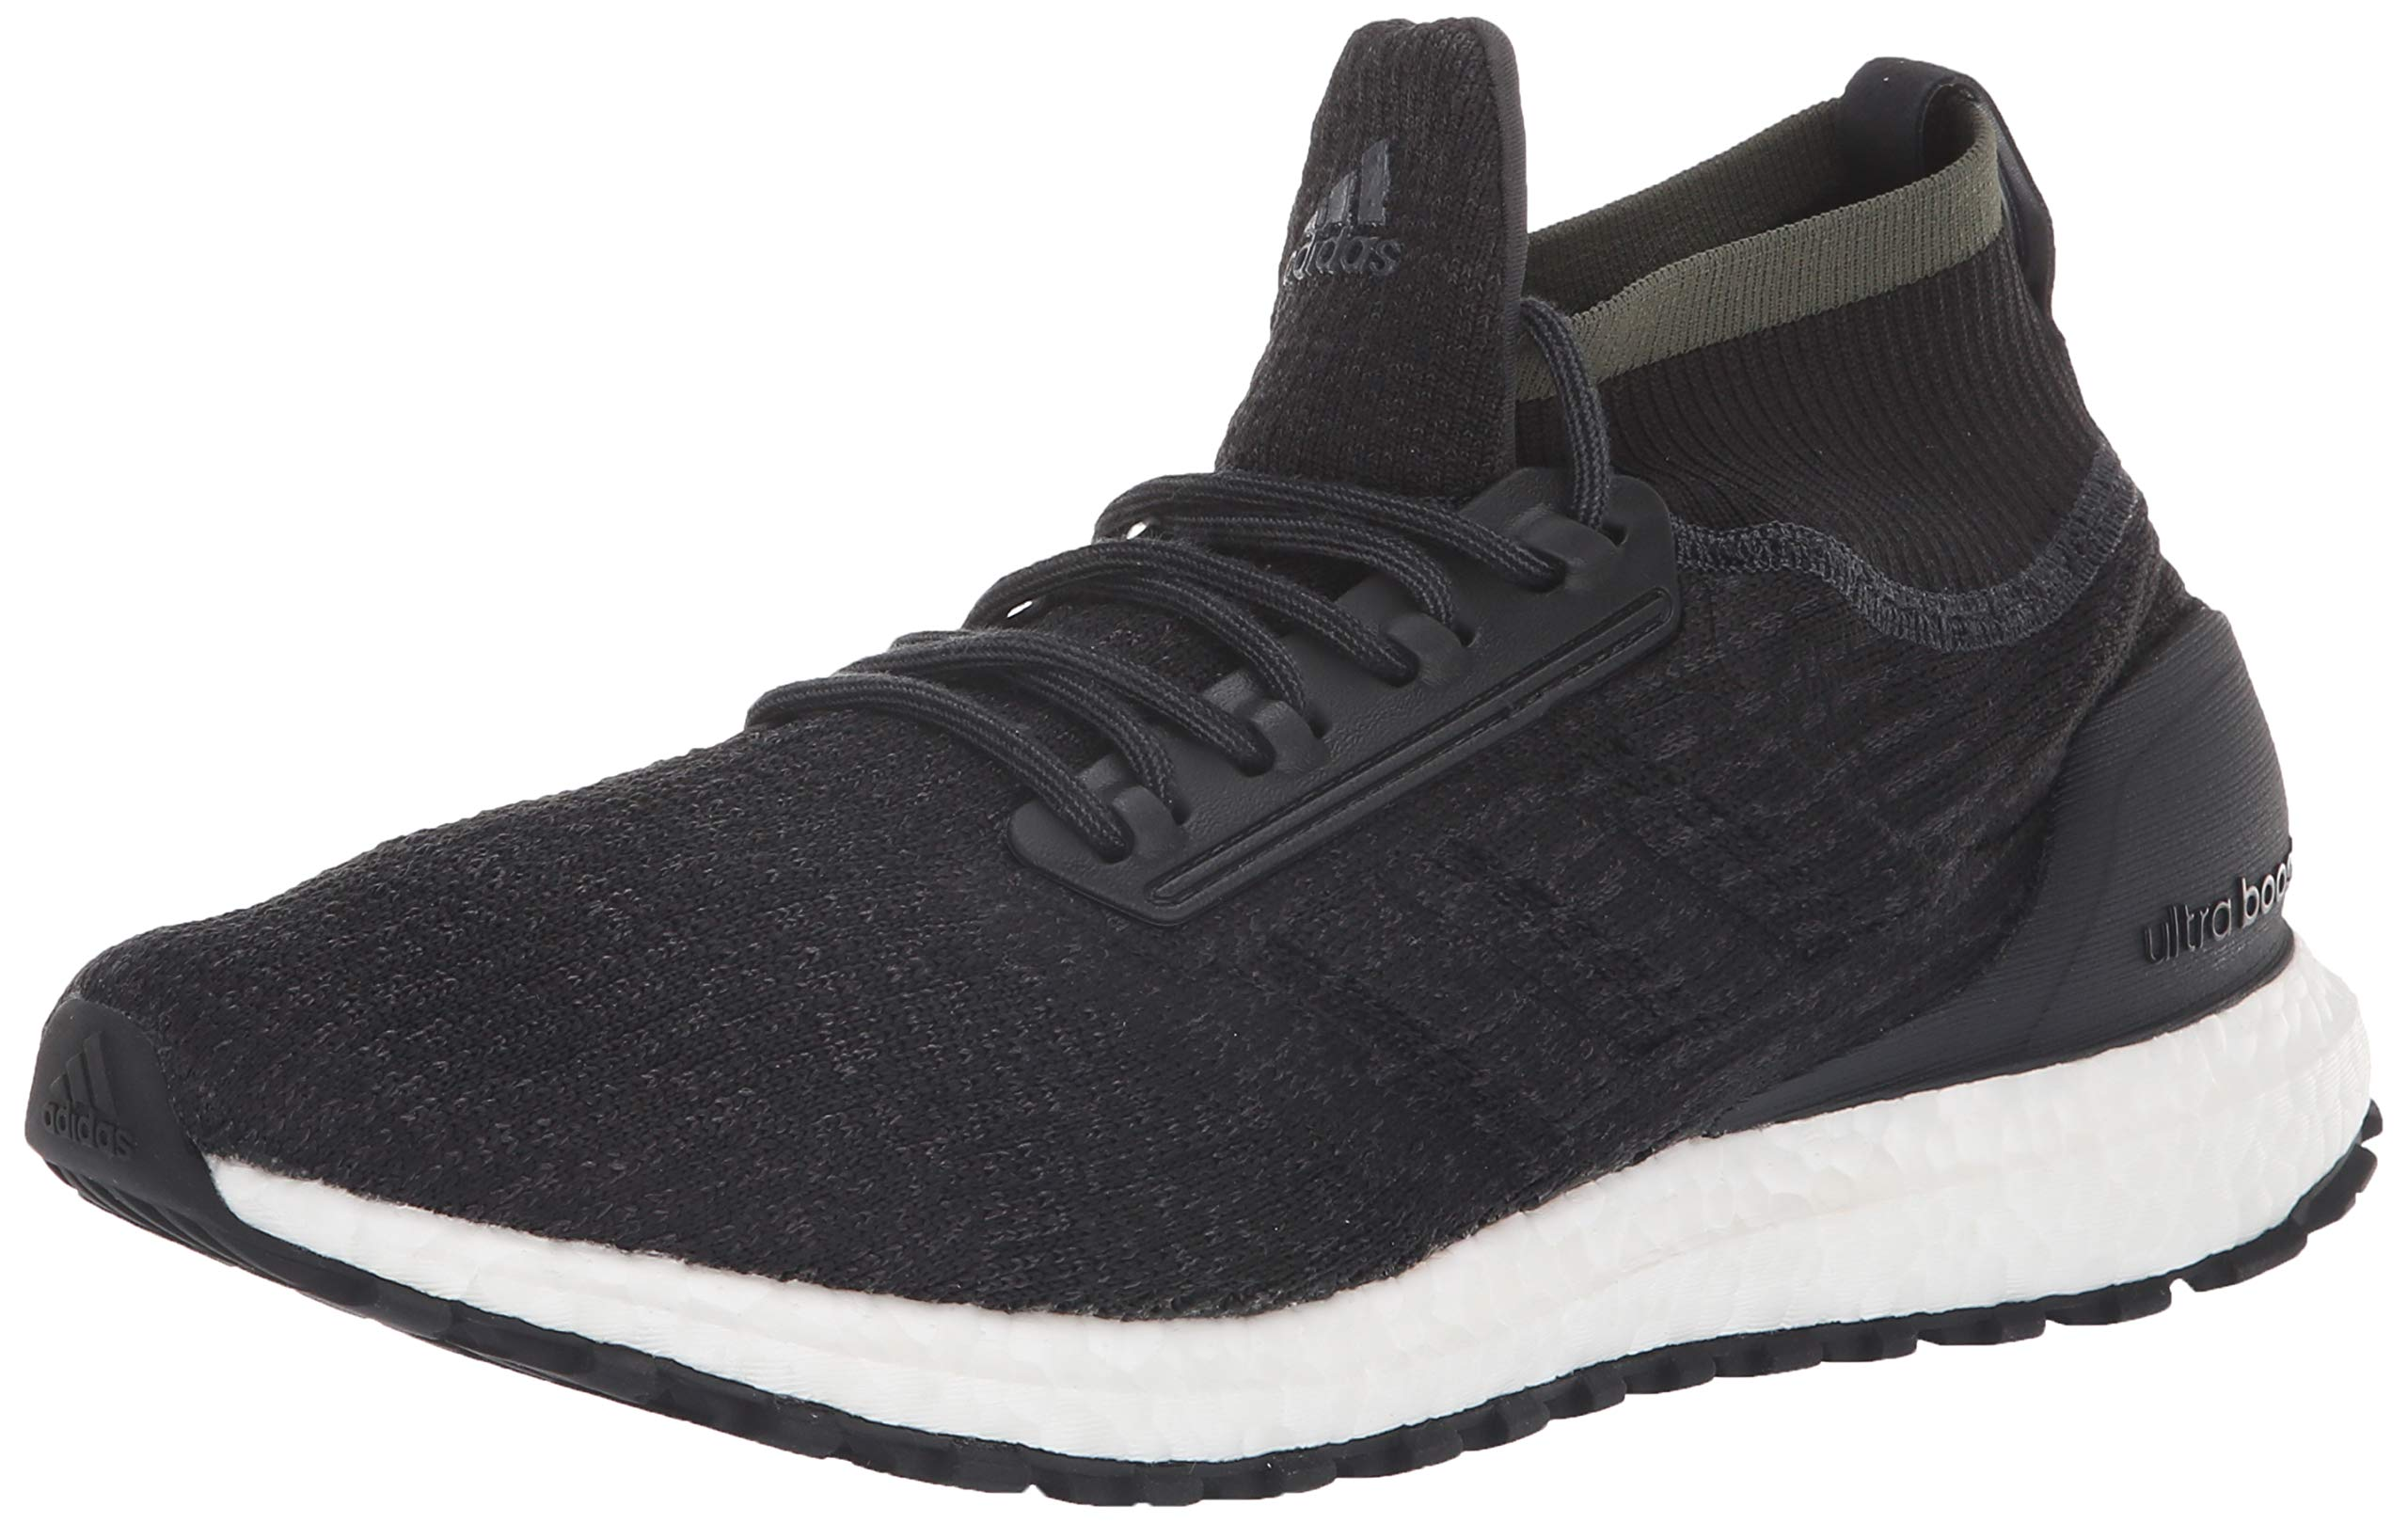 812KHqe7mVL - adidas Men's Ultraboost All Terrain Running Shoe